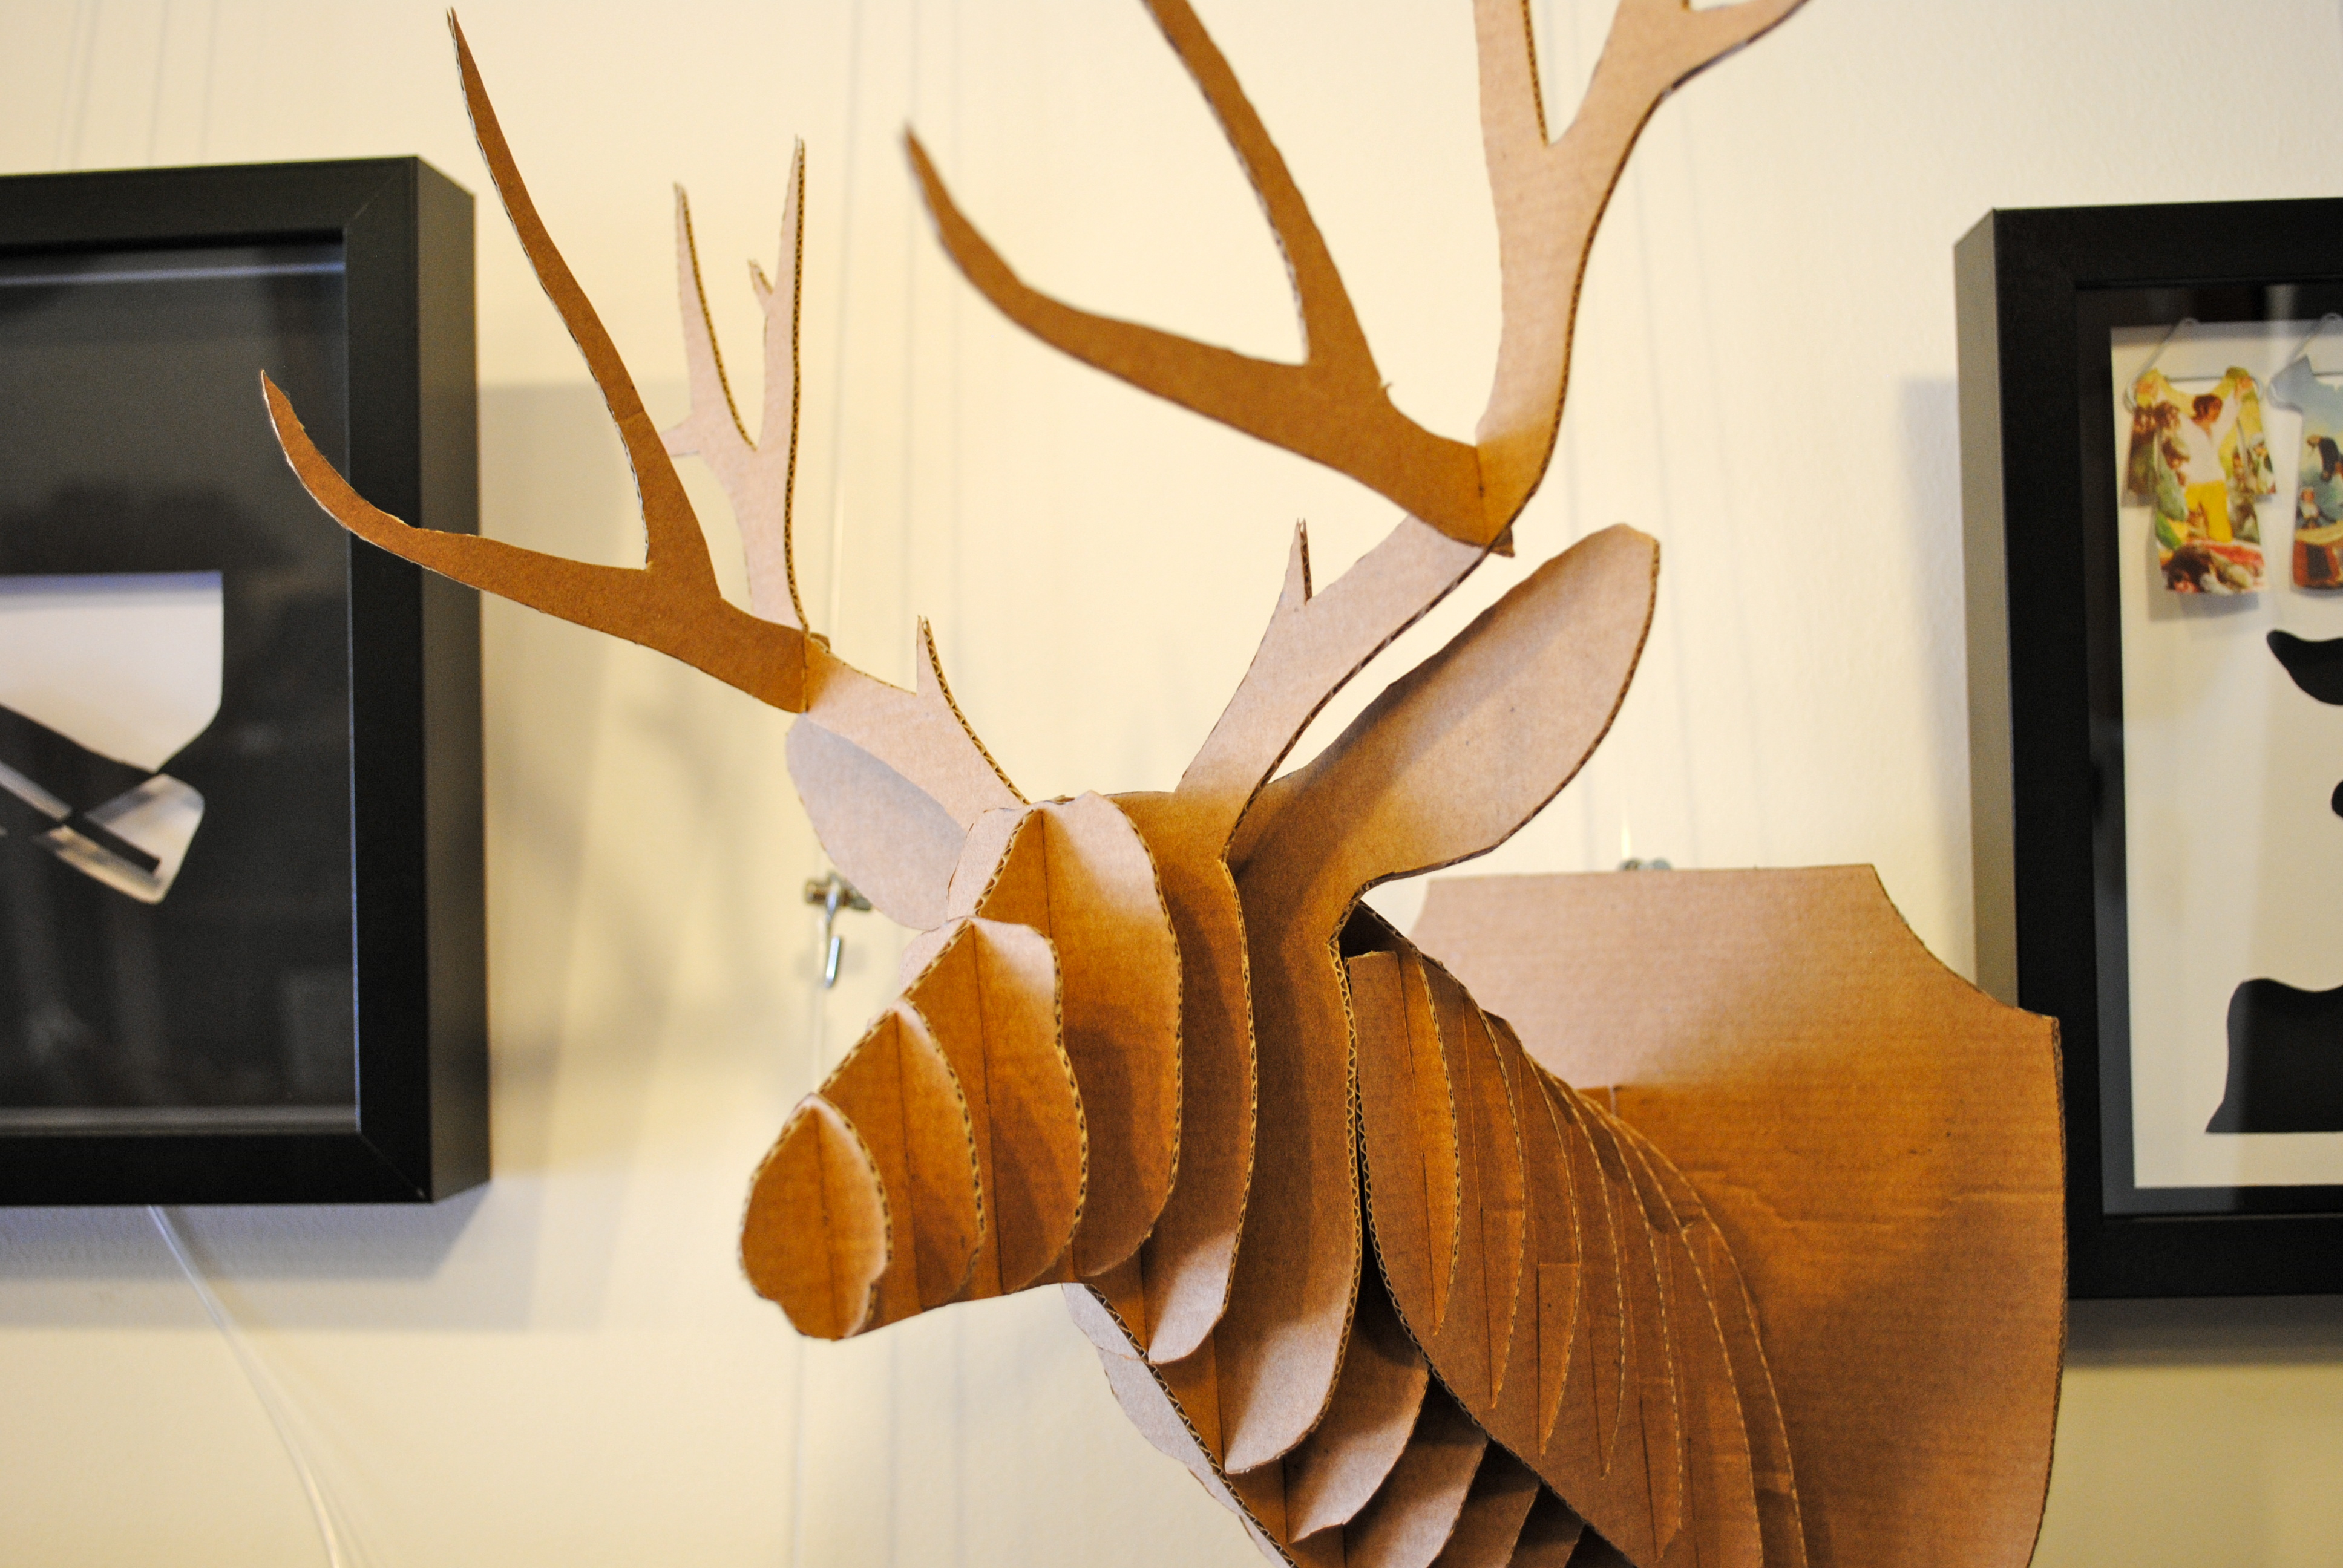 Cabeza de ciervo en cart n ii la cartoneria - Cabeza ciervo carton ...